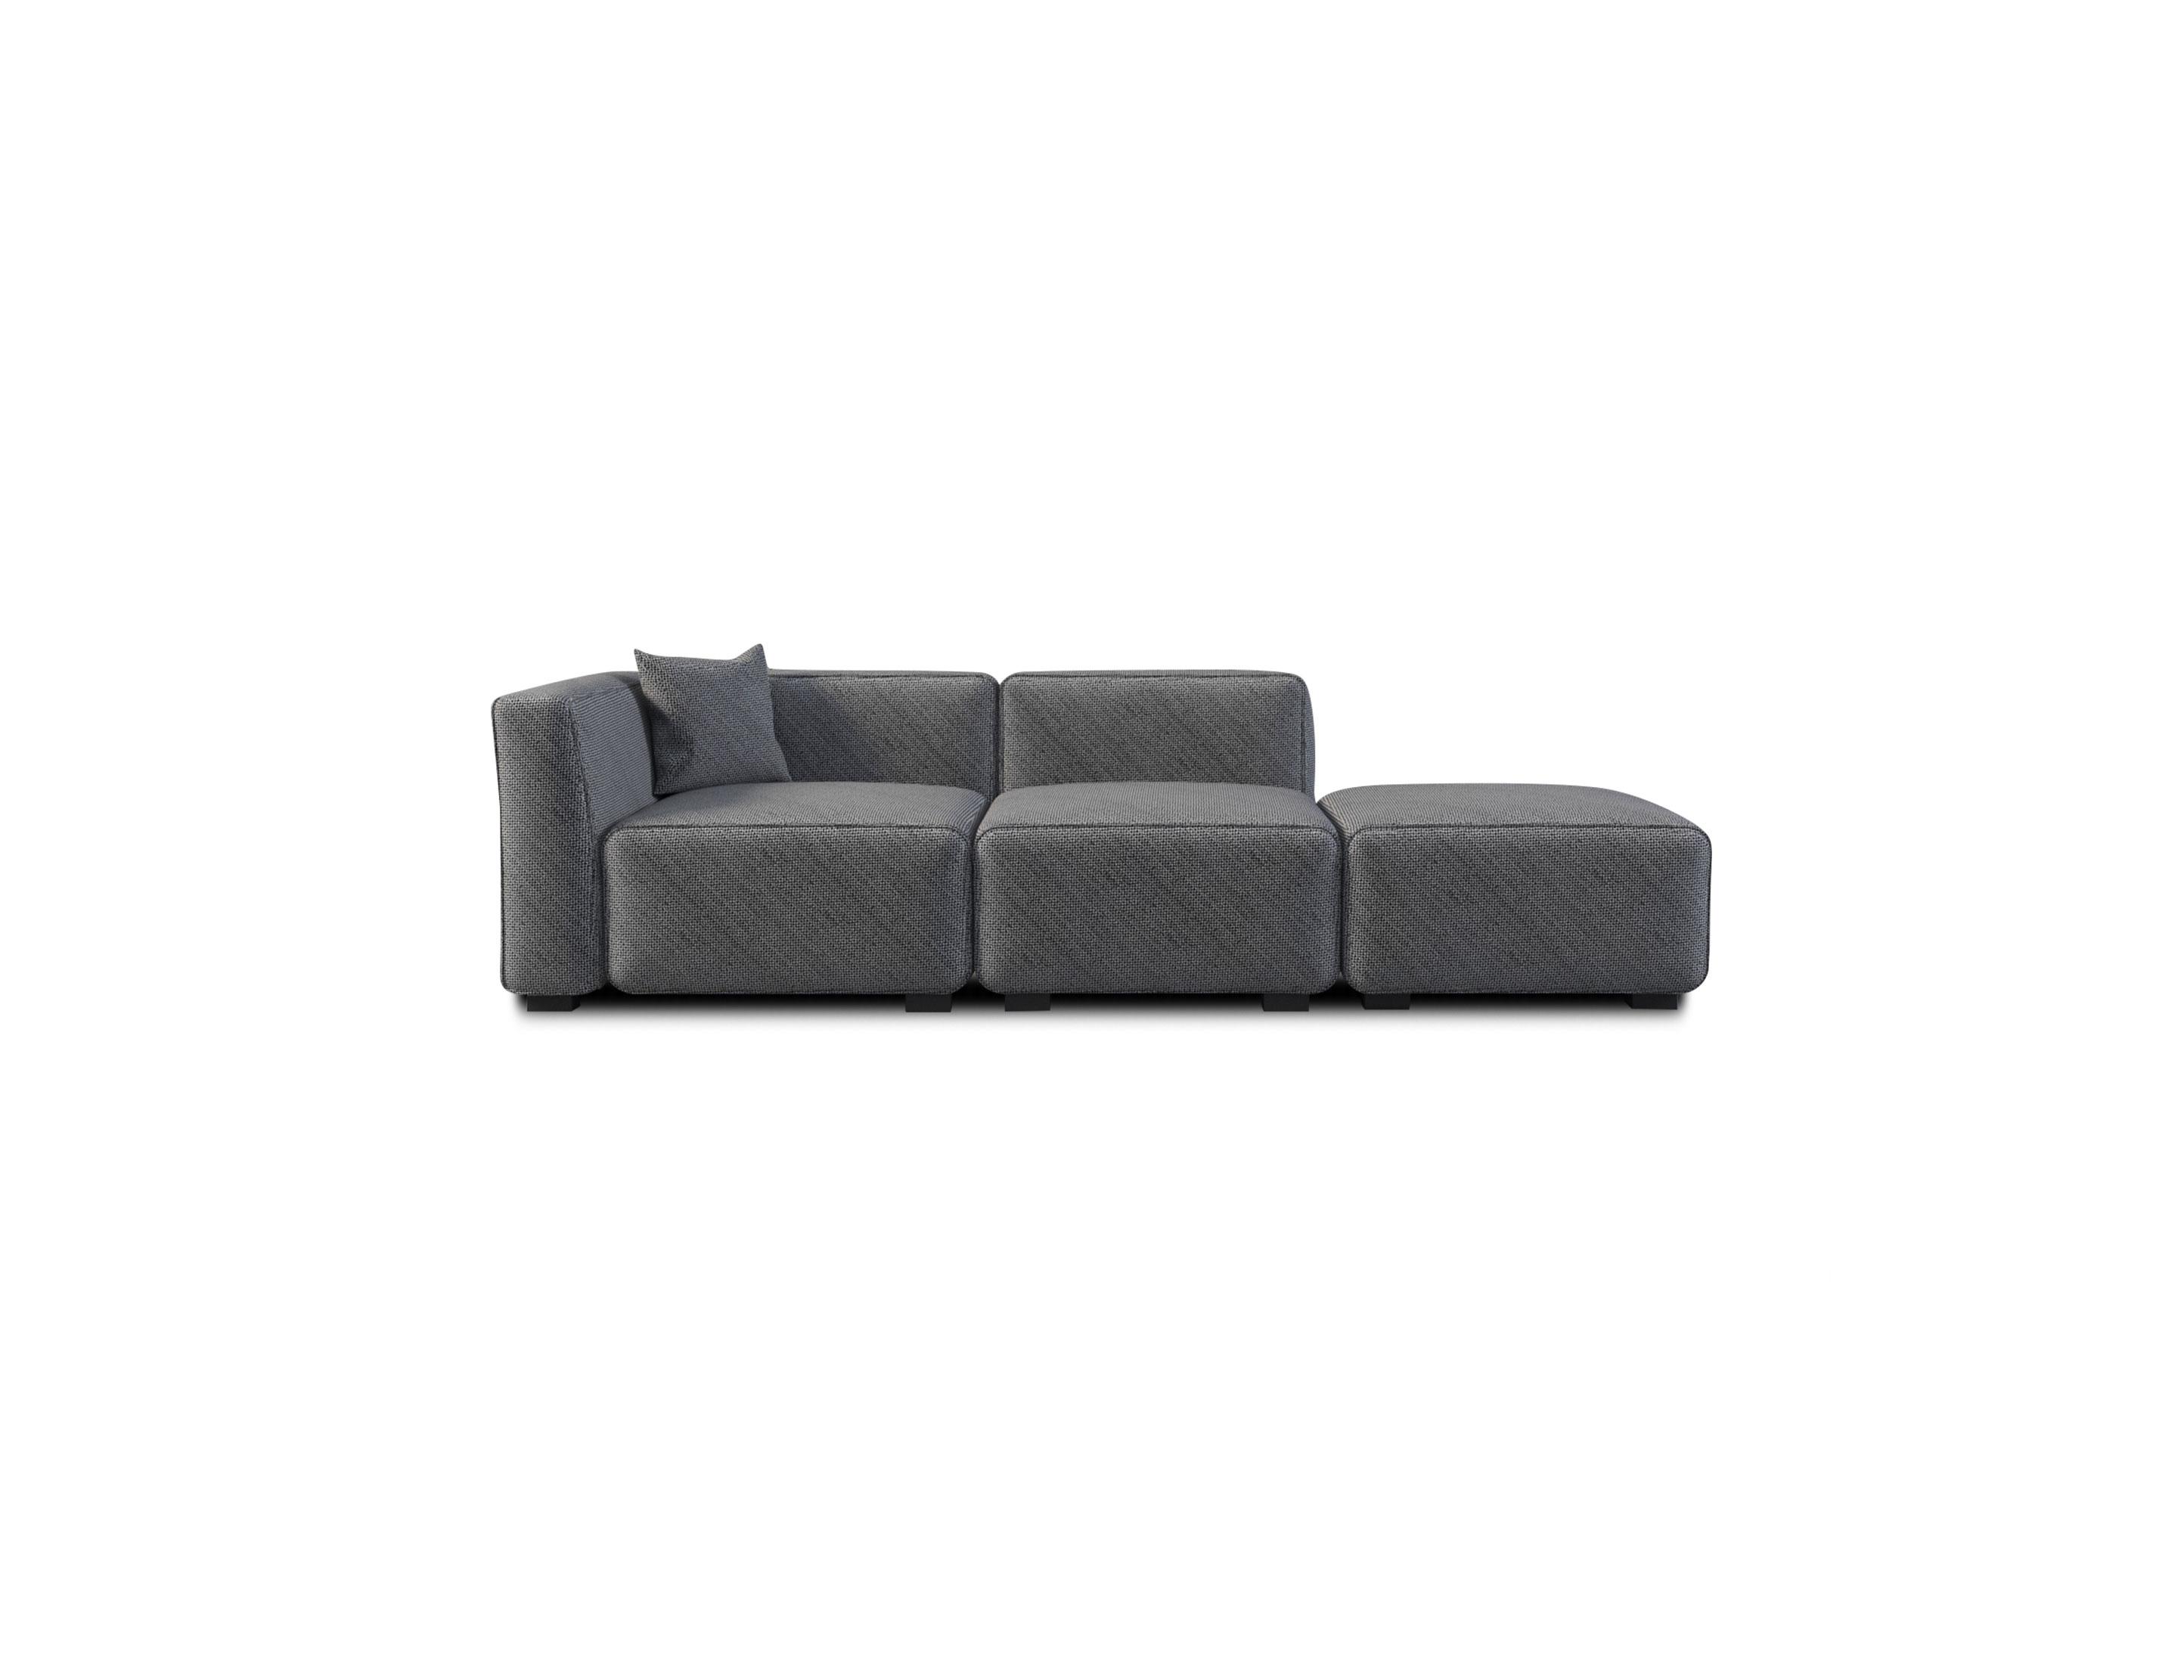 Soft Cube Contemporary Sofa 3 Seats